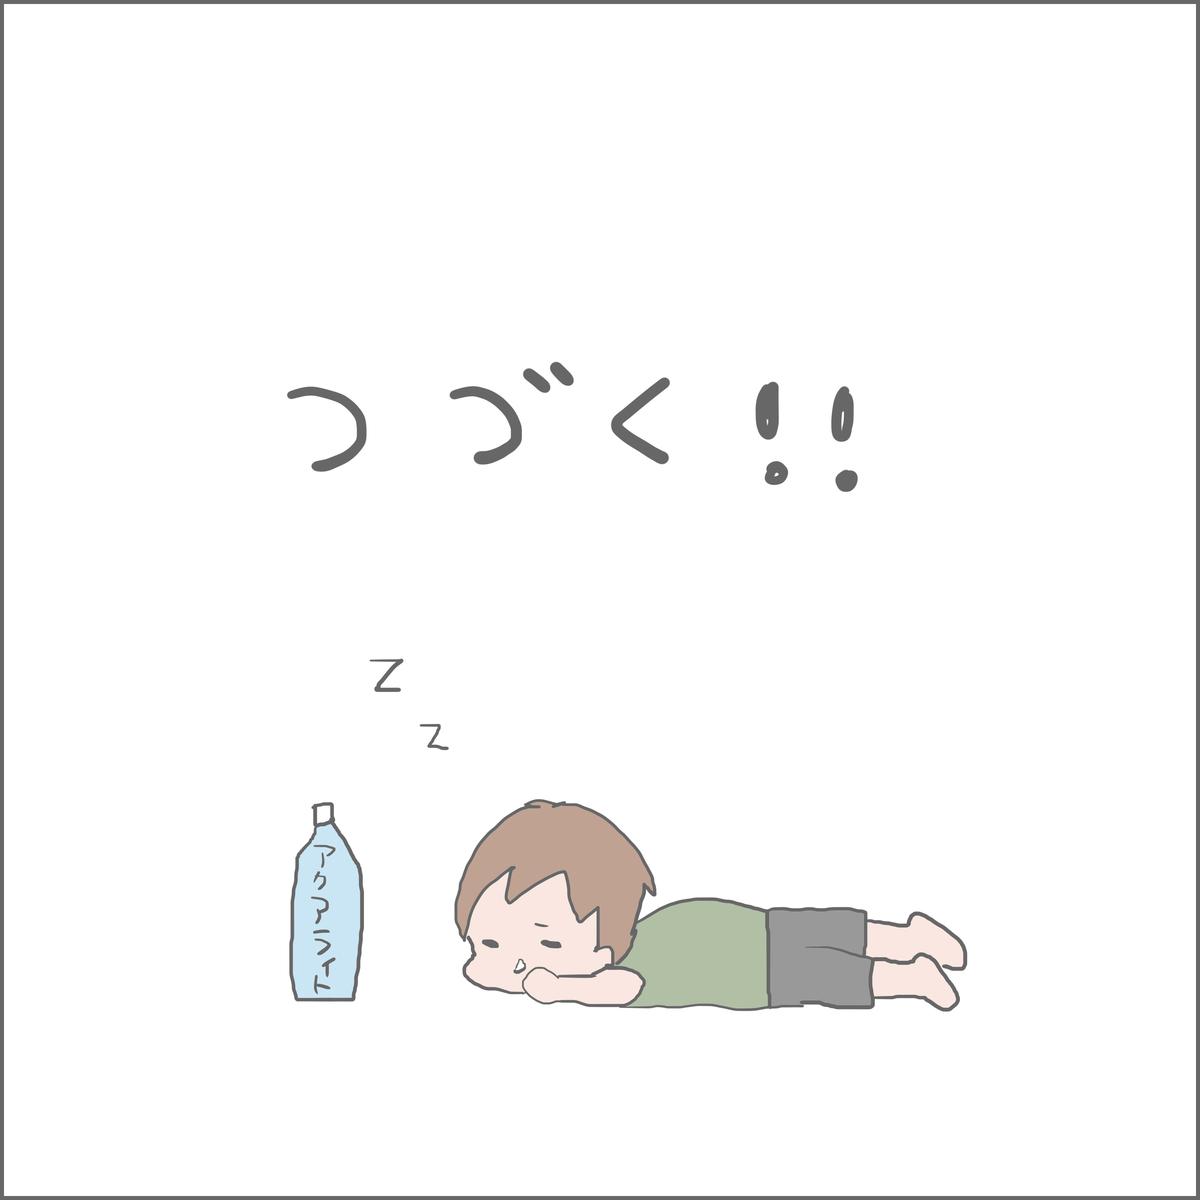 f:id:ika_yoshi:20210606012149j:plain